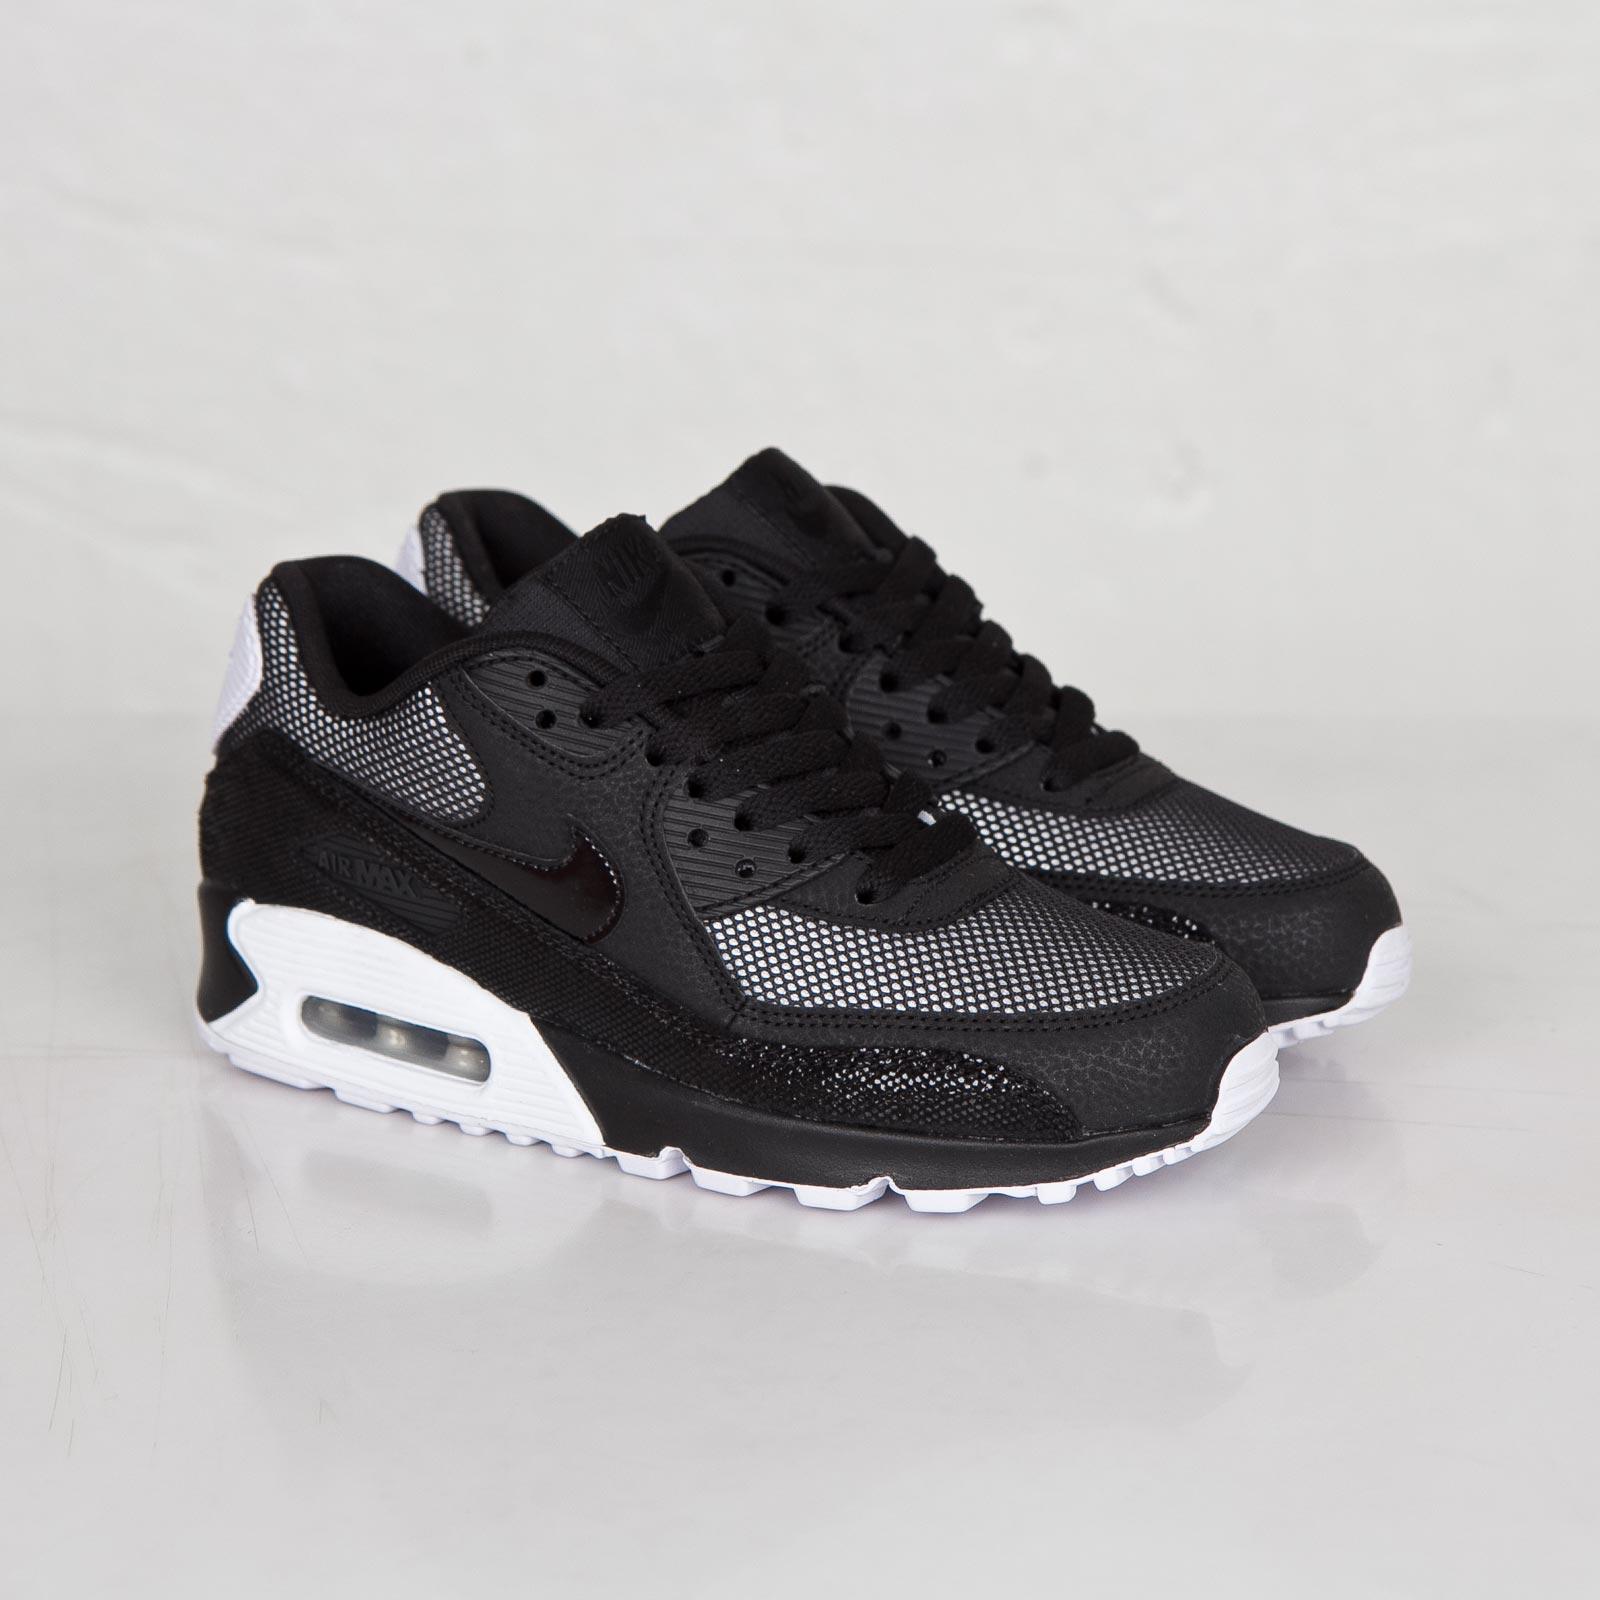 buy online f97ca ebc68 Nike Wmns Air Max 90 Premium